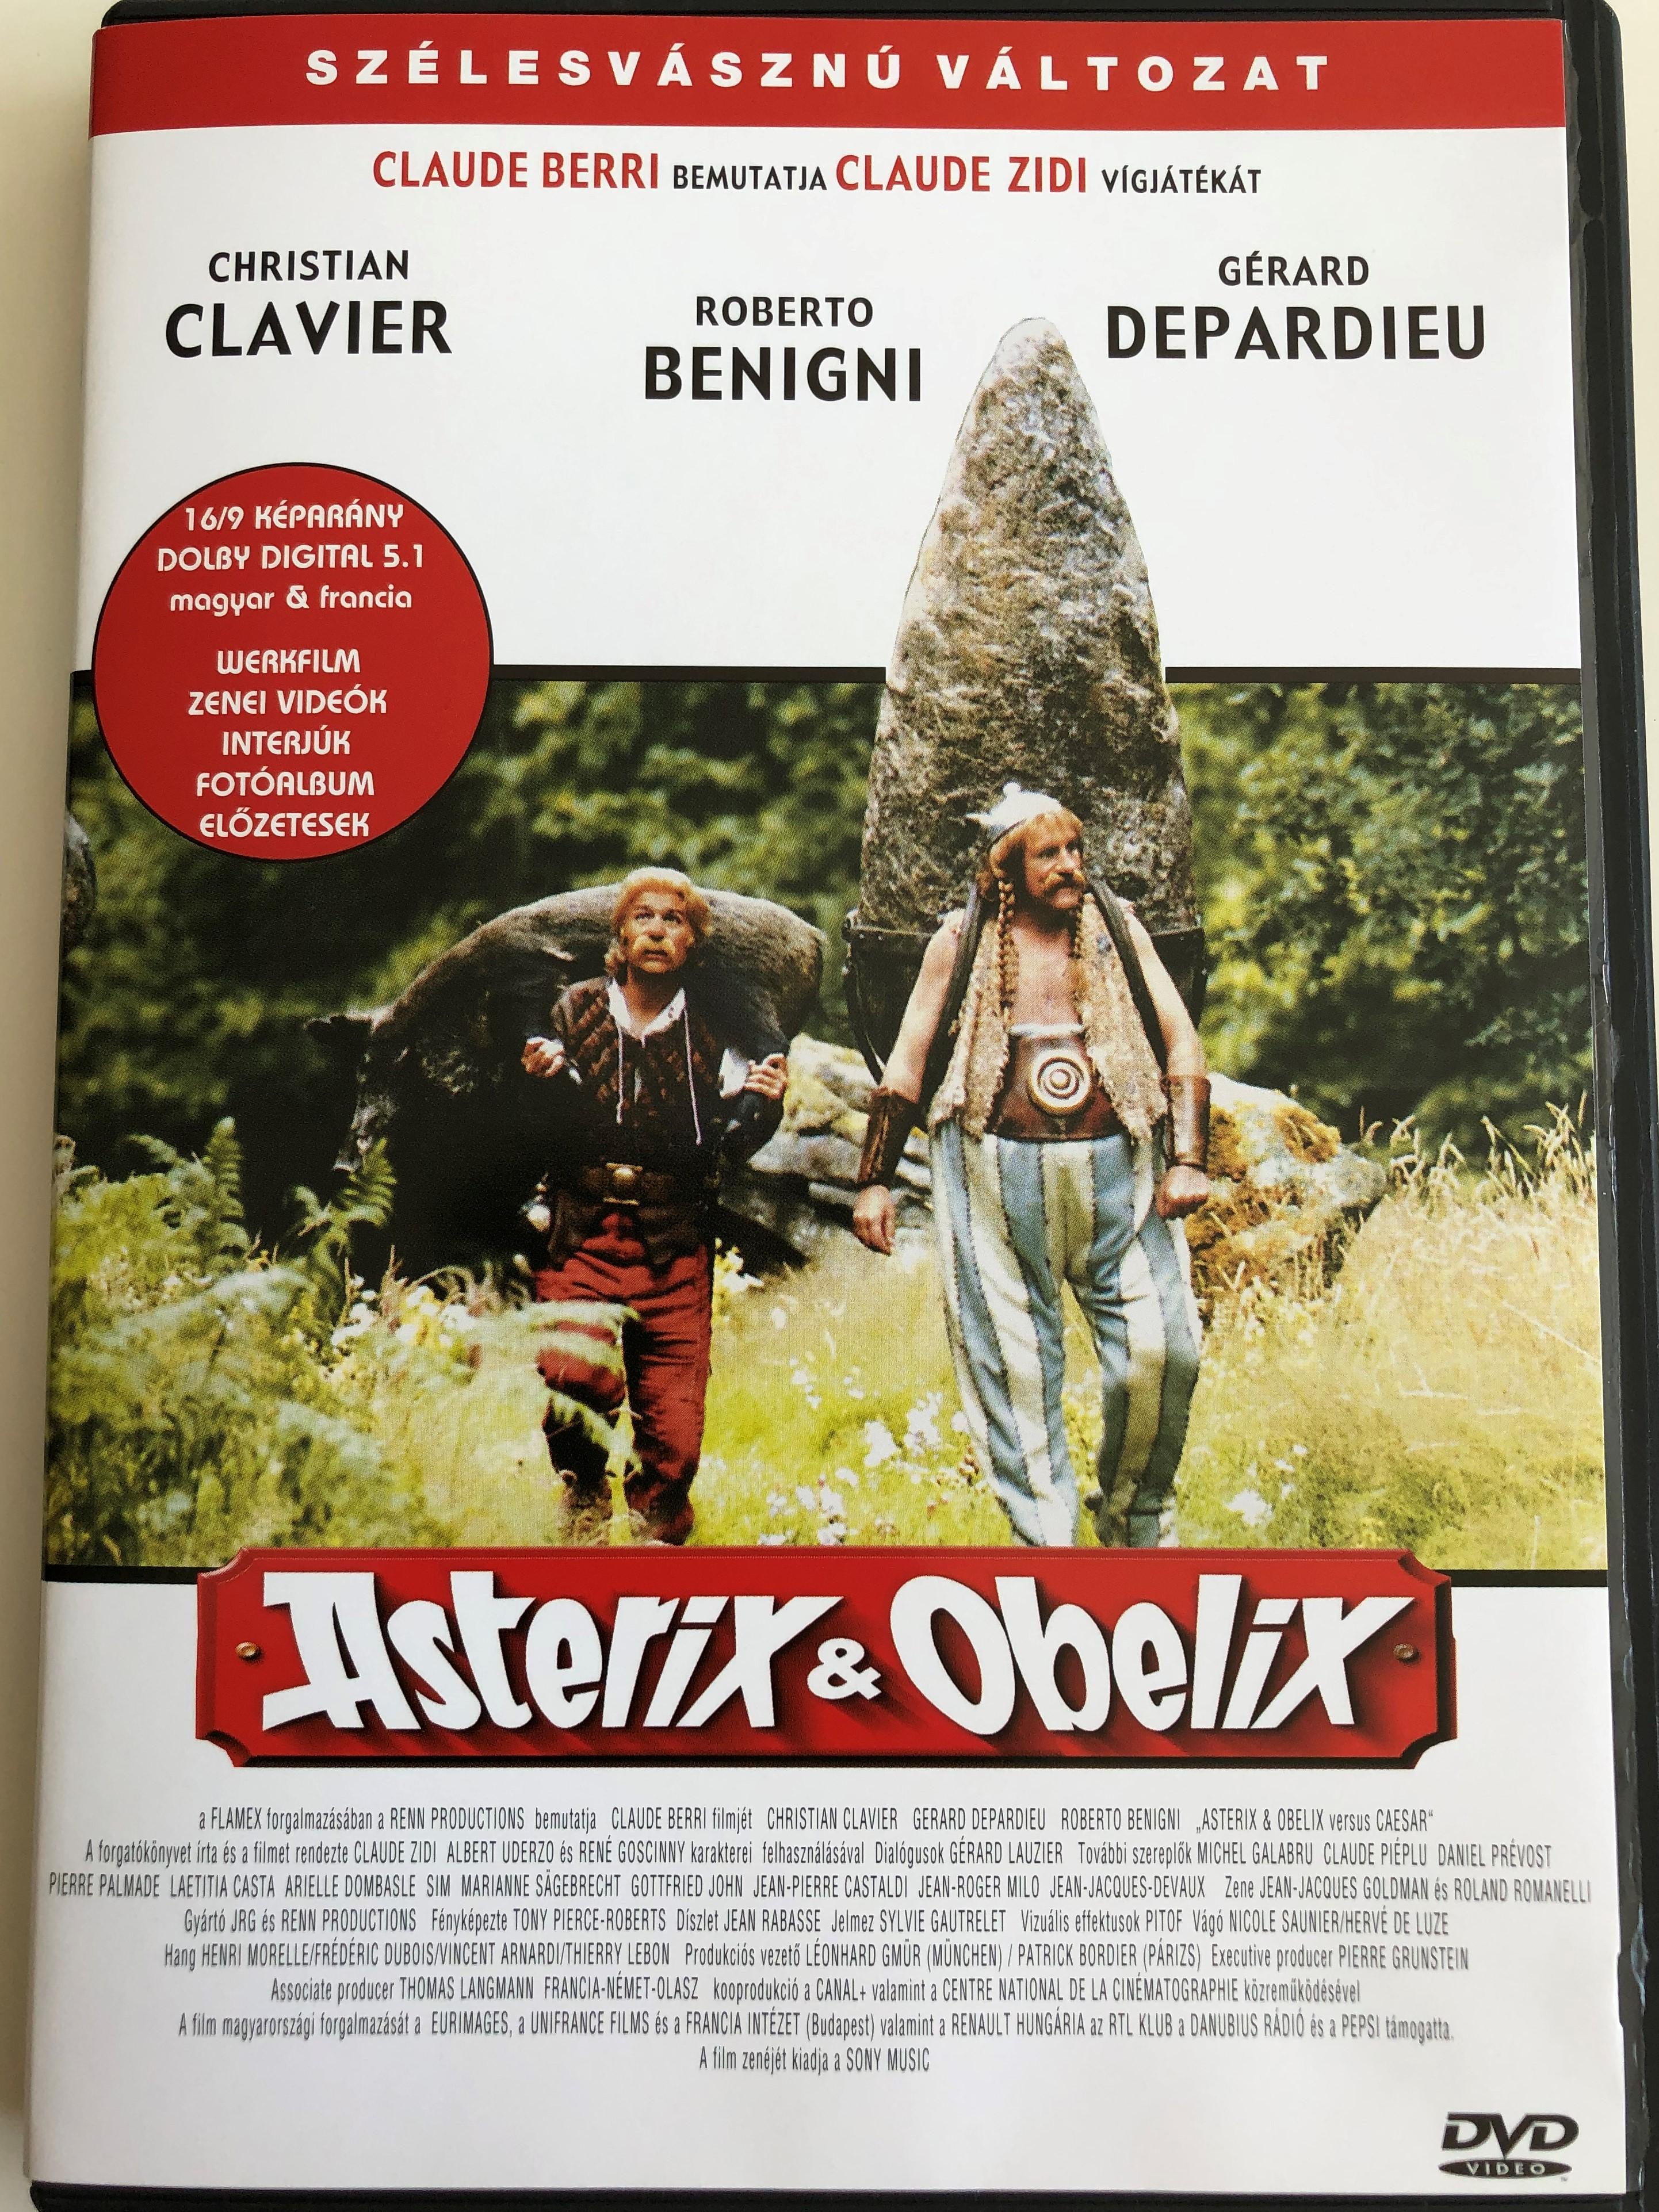 asterix-et-obelix-dvd-1999-asterix-s-obelix-directed-by-claude-zidi-starring-christian-clavier-g-rard-depardieu-roberto-benigni-laetitia-casta-1-.jpg